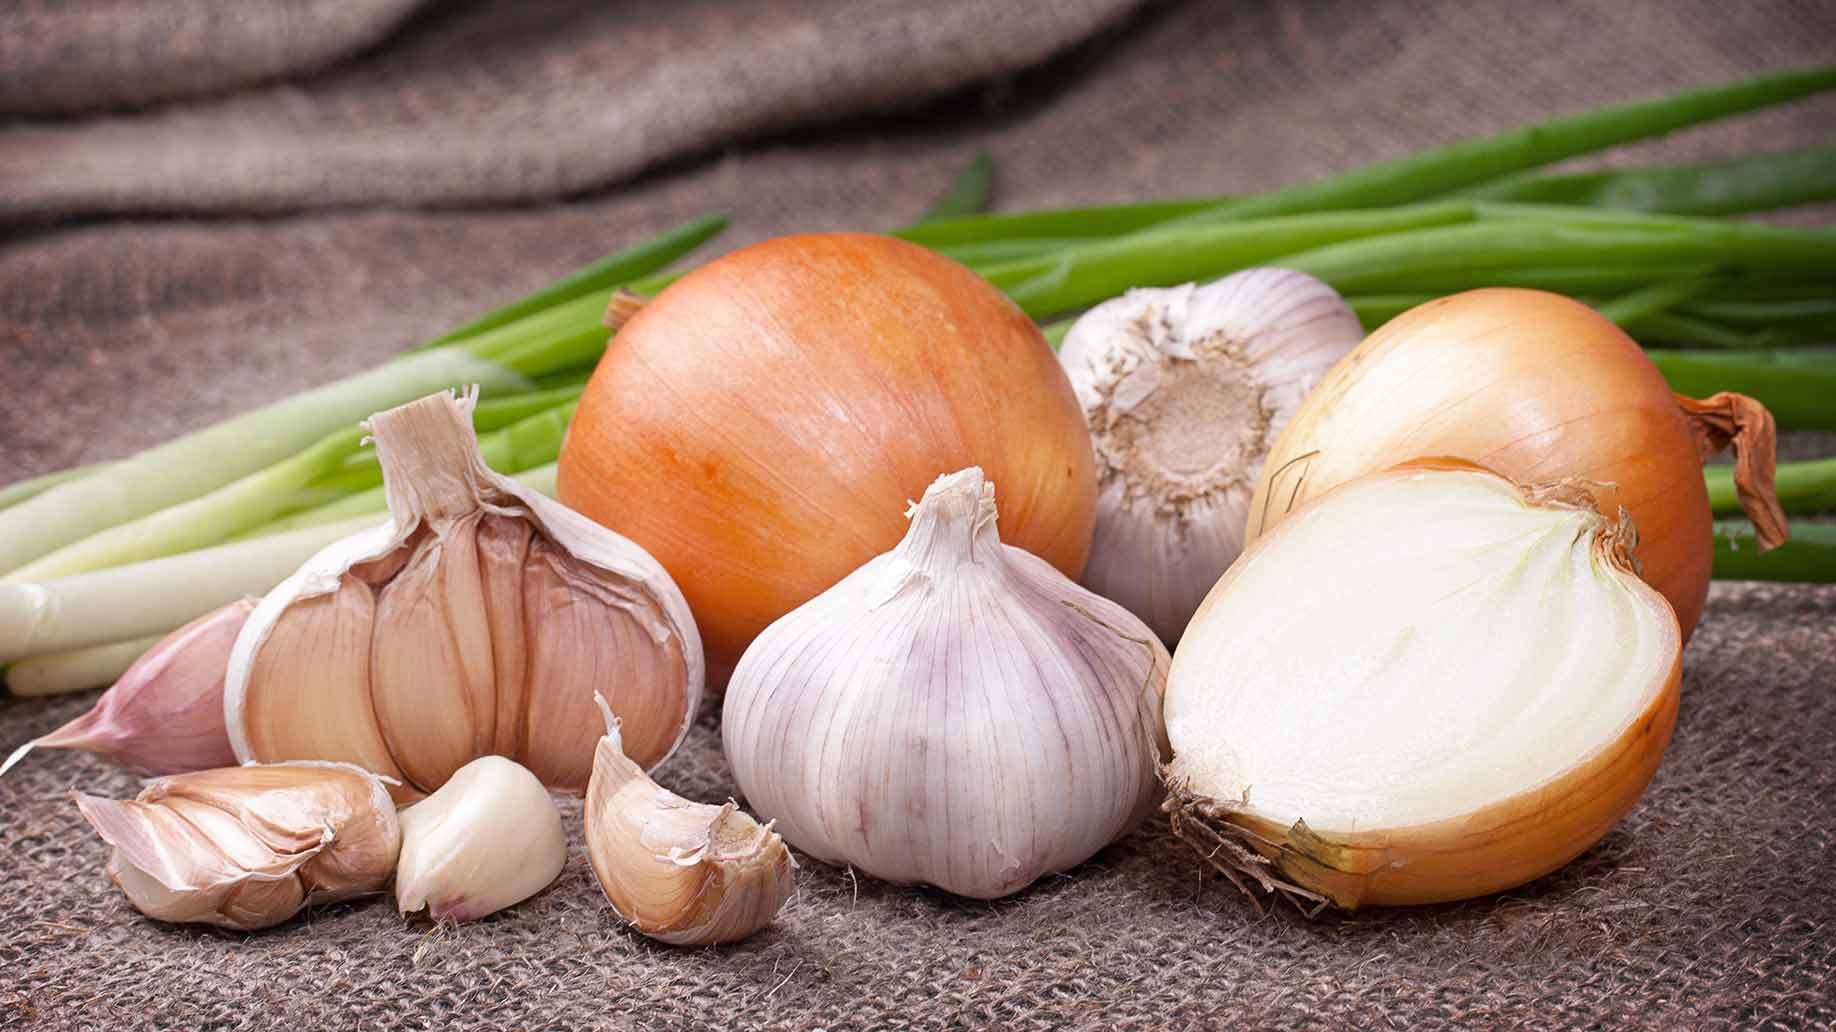 garlic cloves white sliced onions scallions